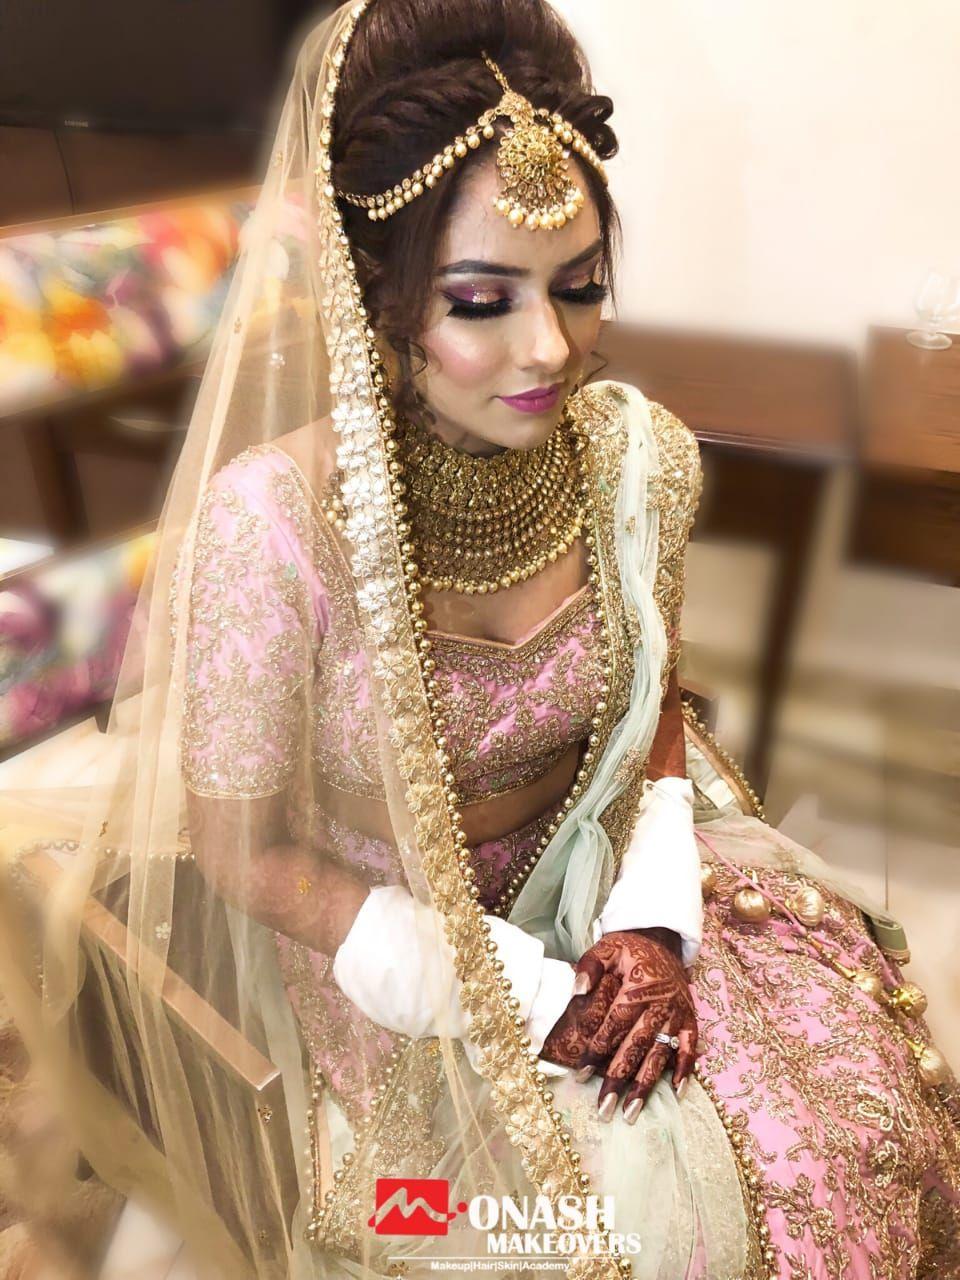 Pin By Devesh On Bride Photoshoot Bridal Hairstyle Indian Wedding Bridal Makeup Bridal Hair And Makeup